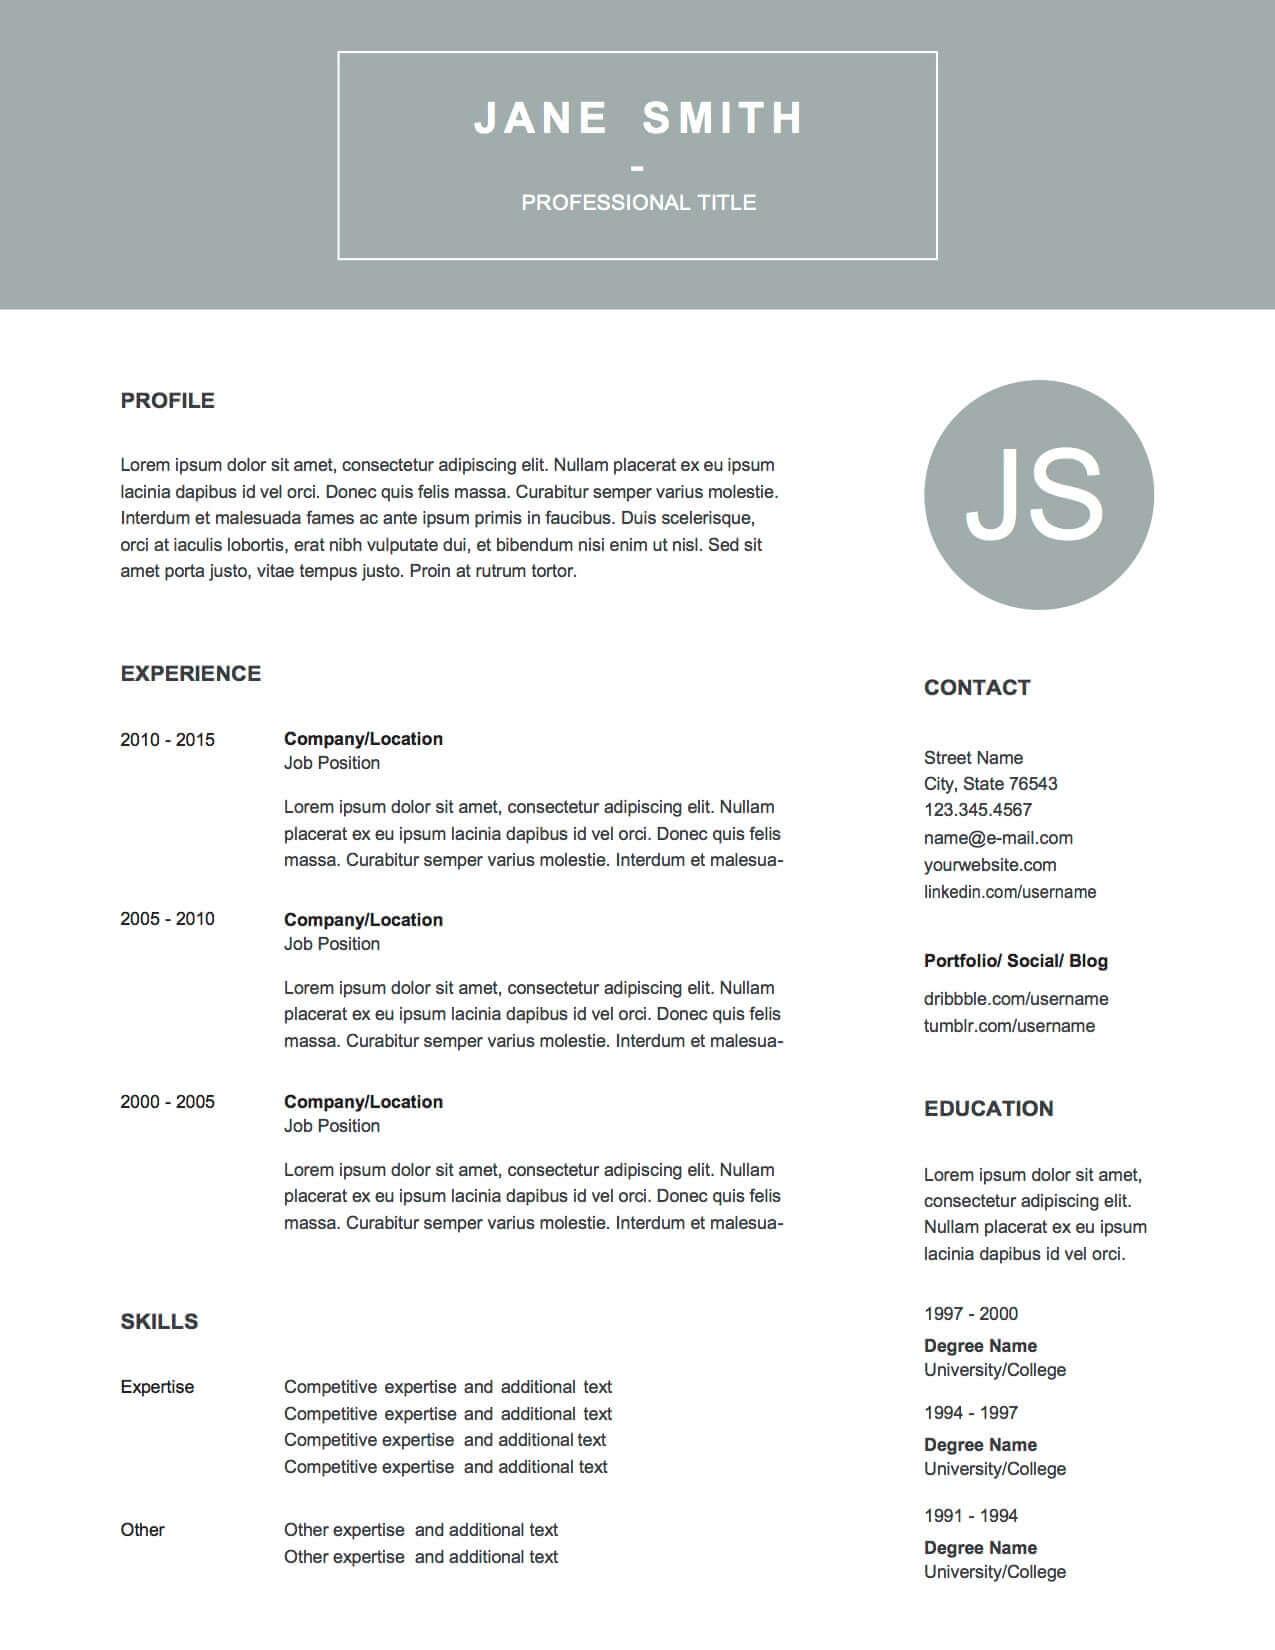 capstone resume services offers new resume designs capstone capstone resume services new resume designs design 1 resume p 1